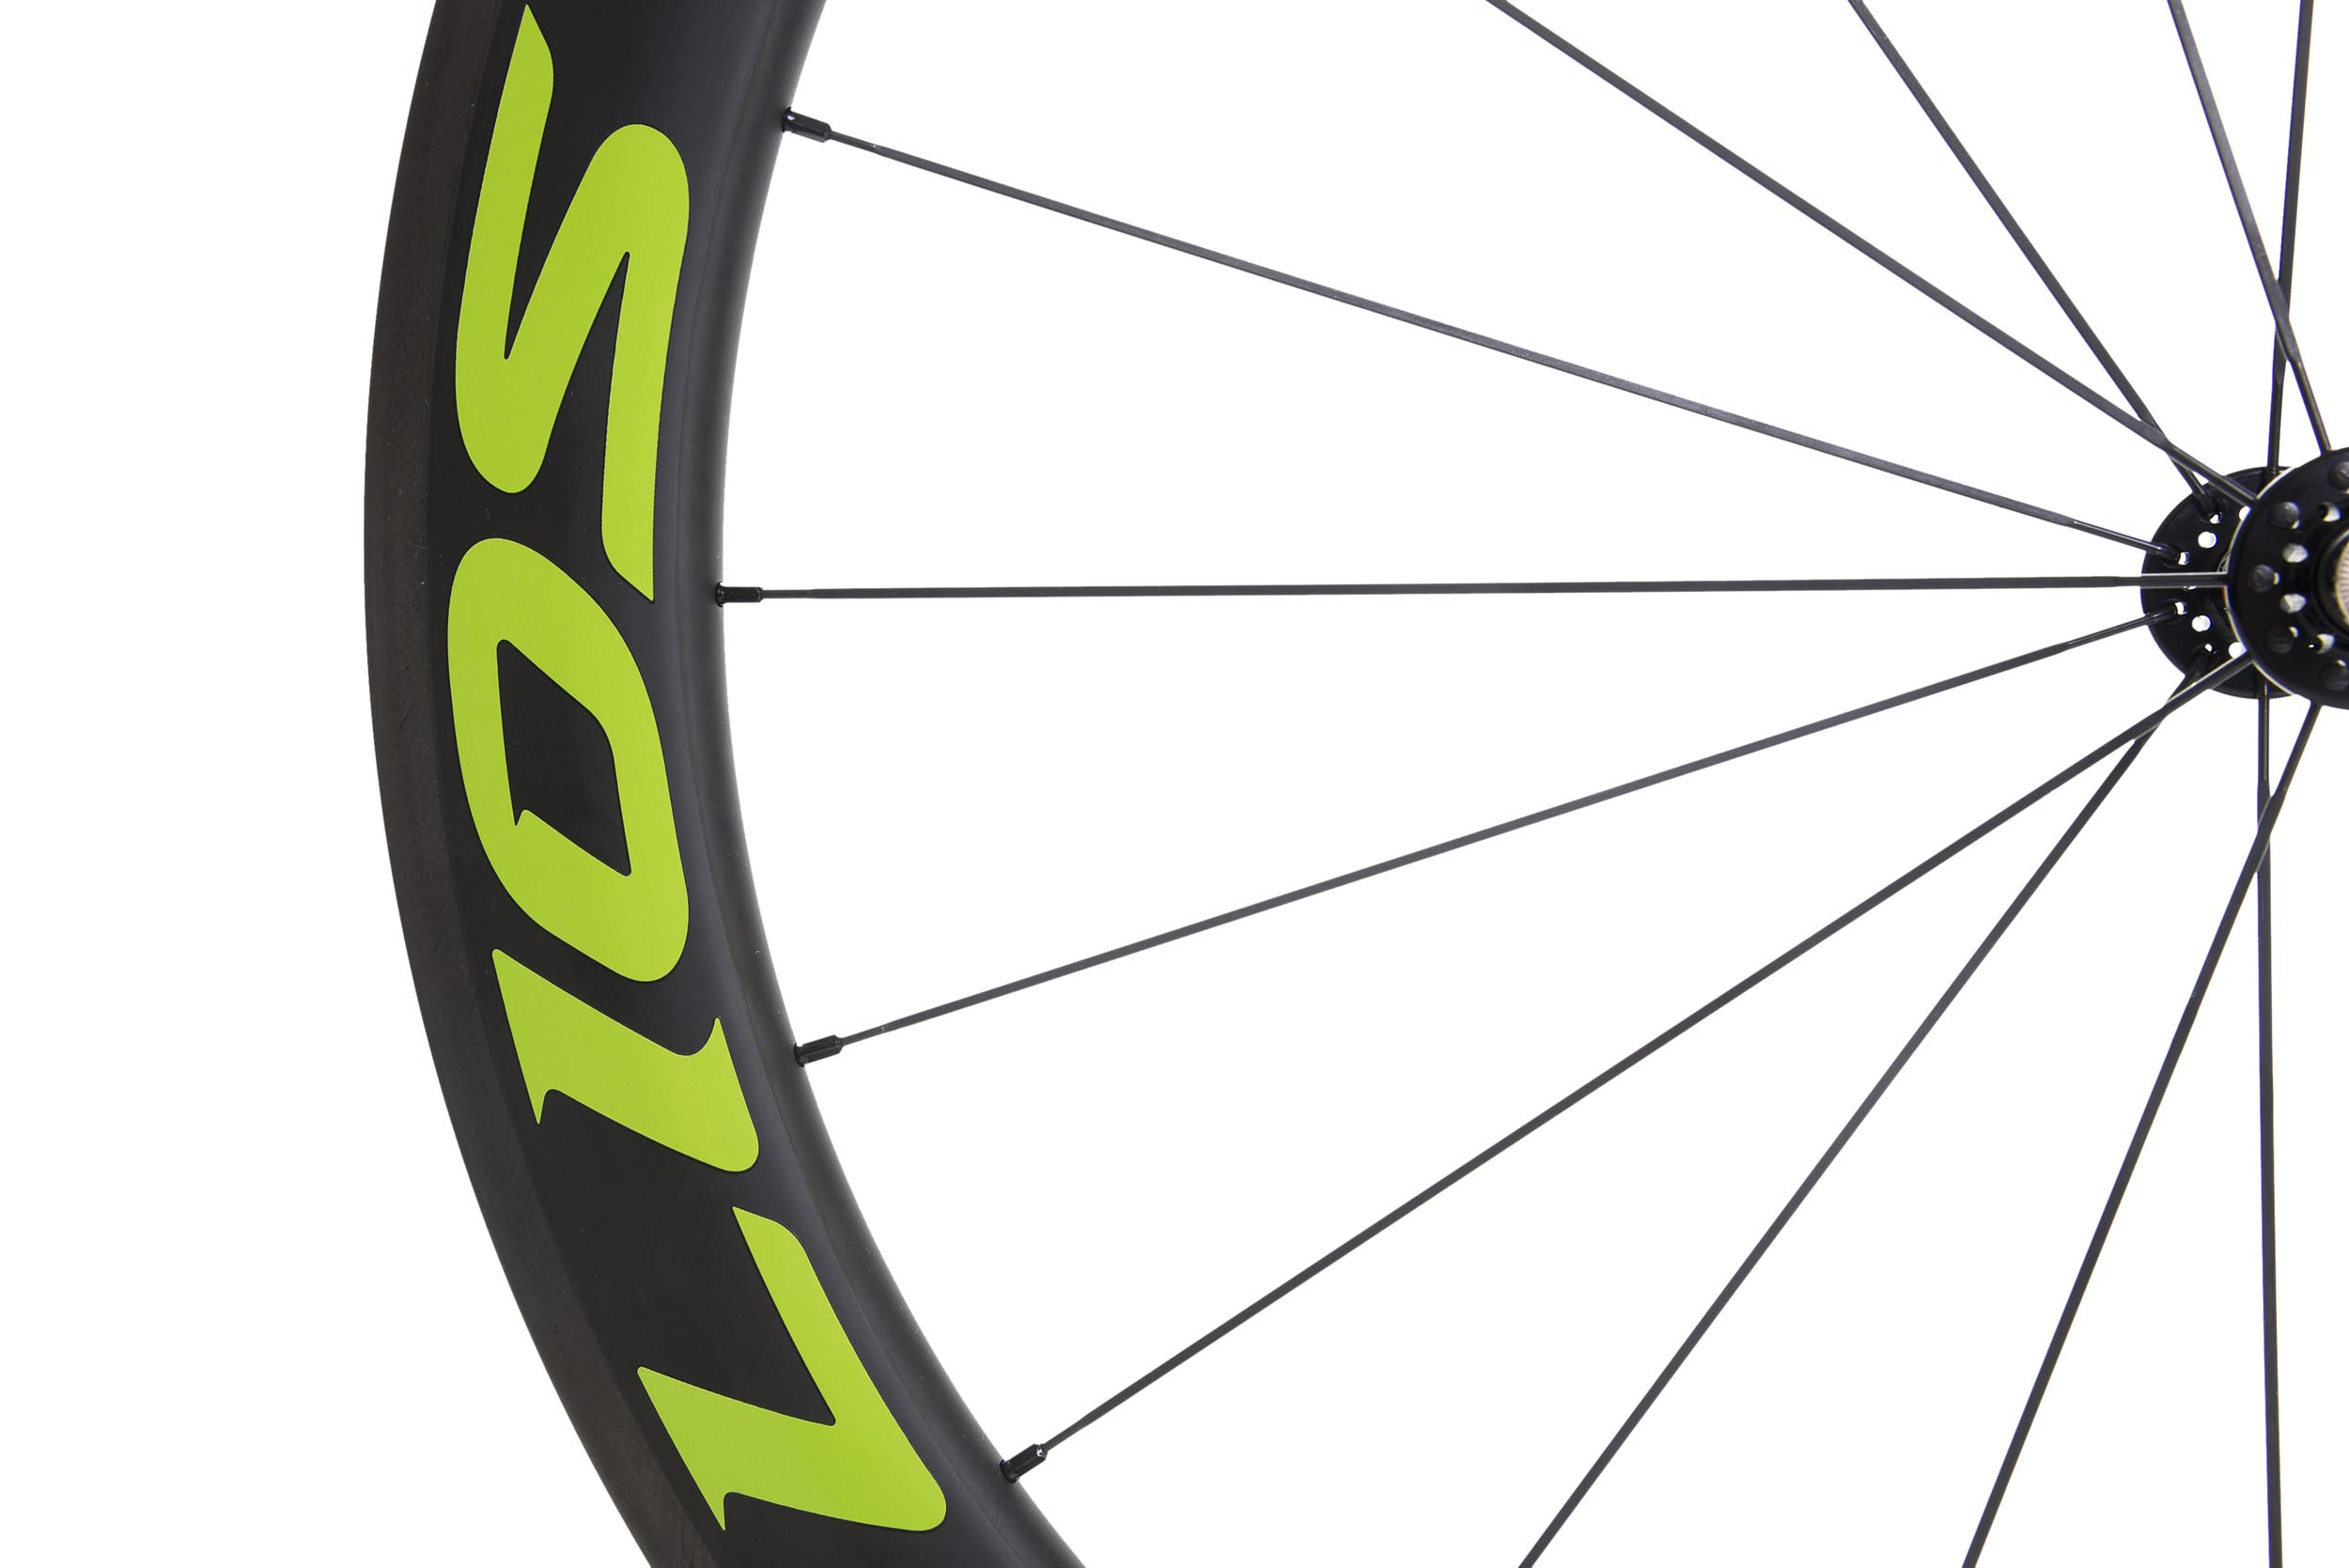 lios-c60-carbon-wheelset-green-image-4